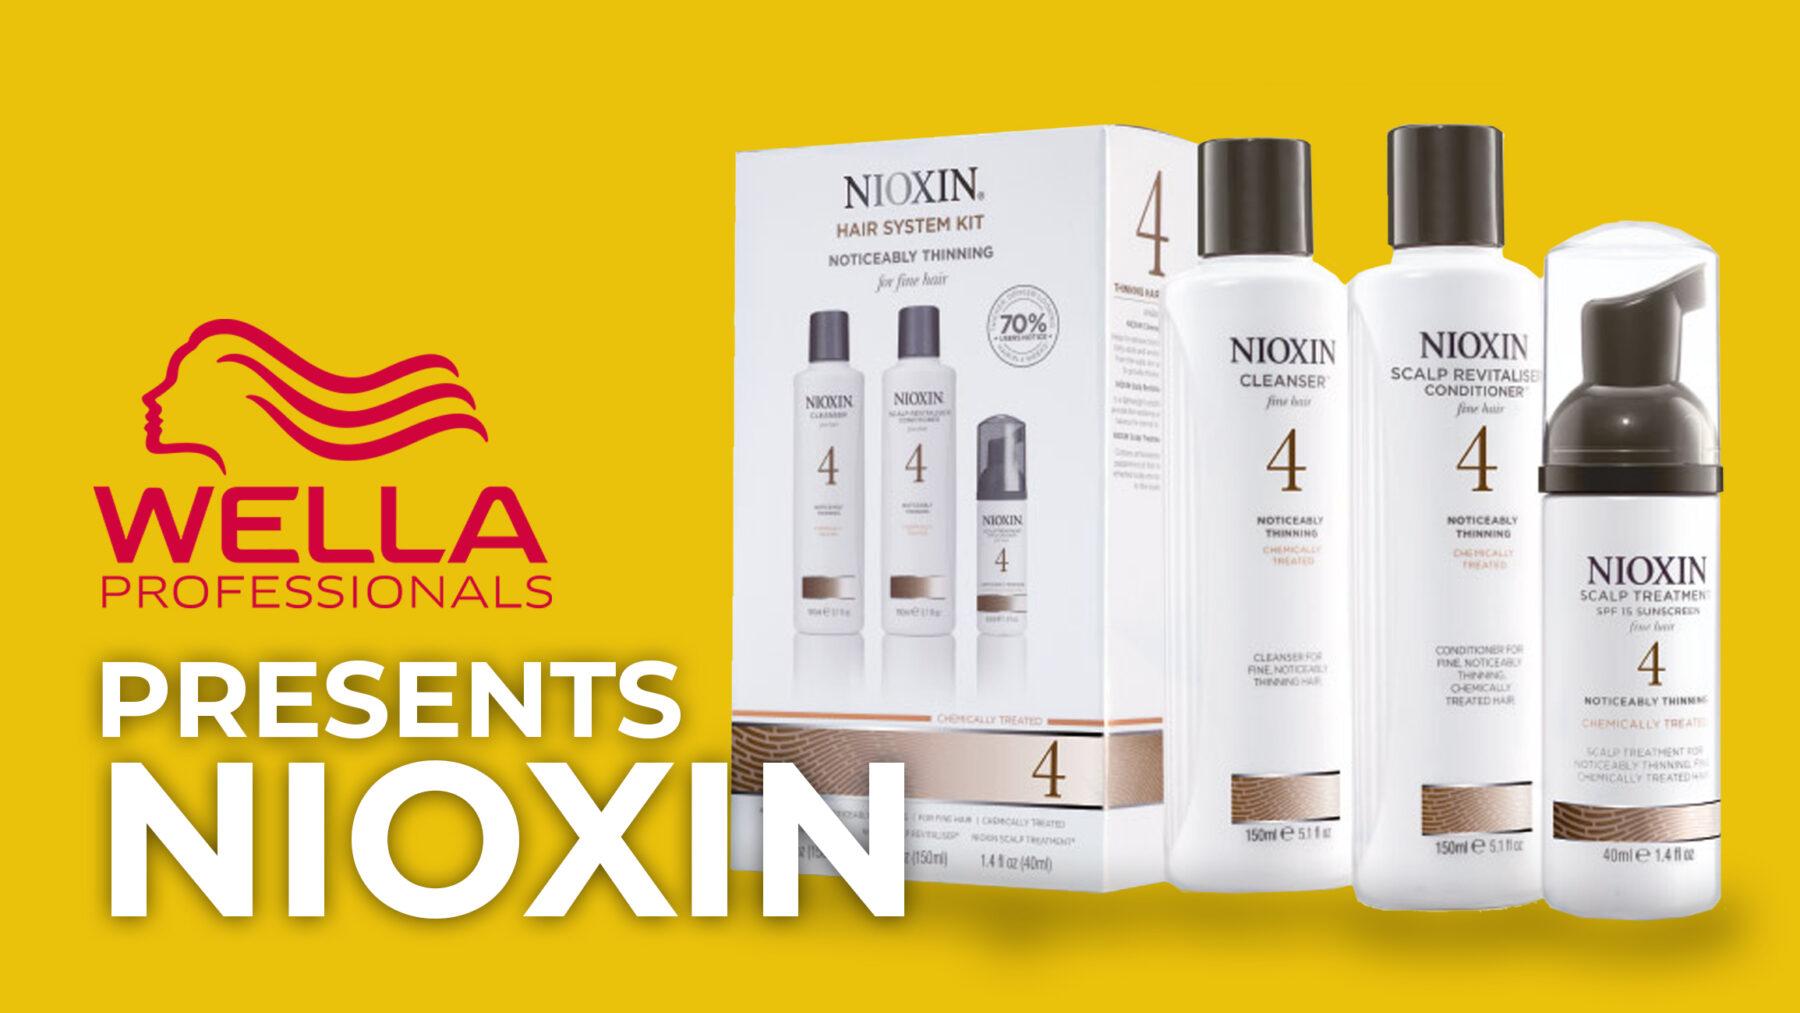 Wella Presents Nioxin